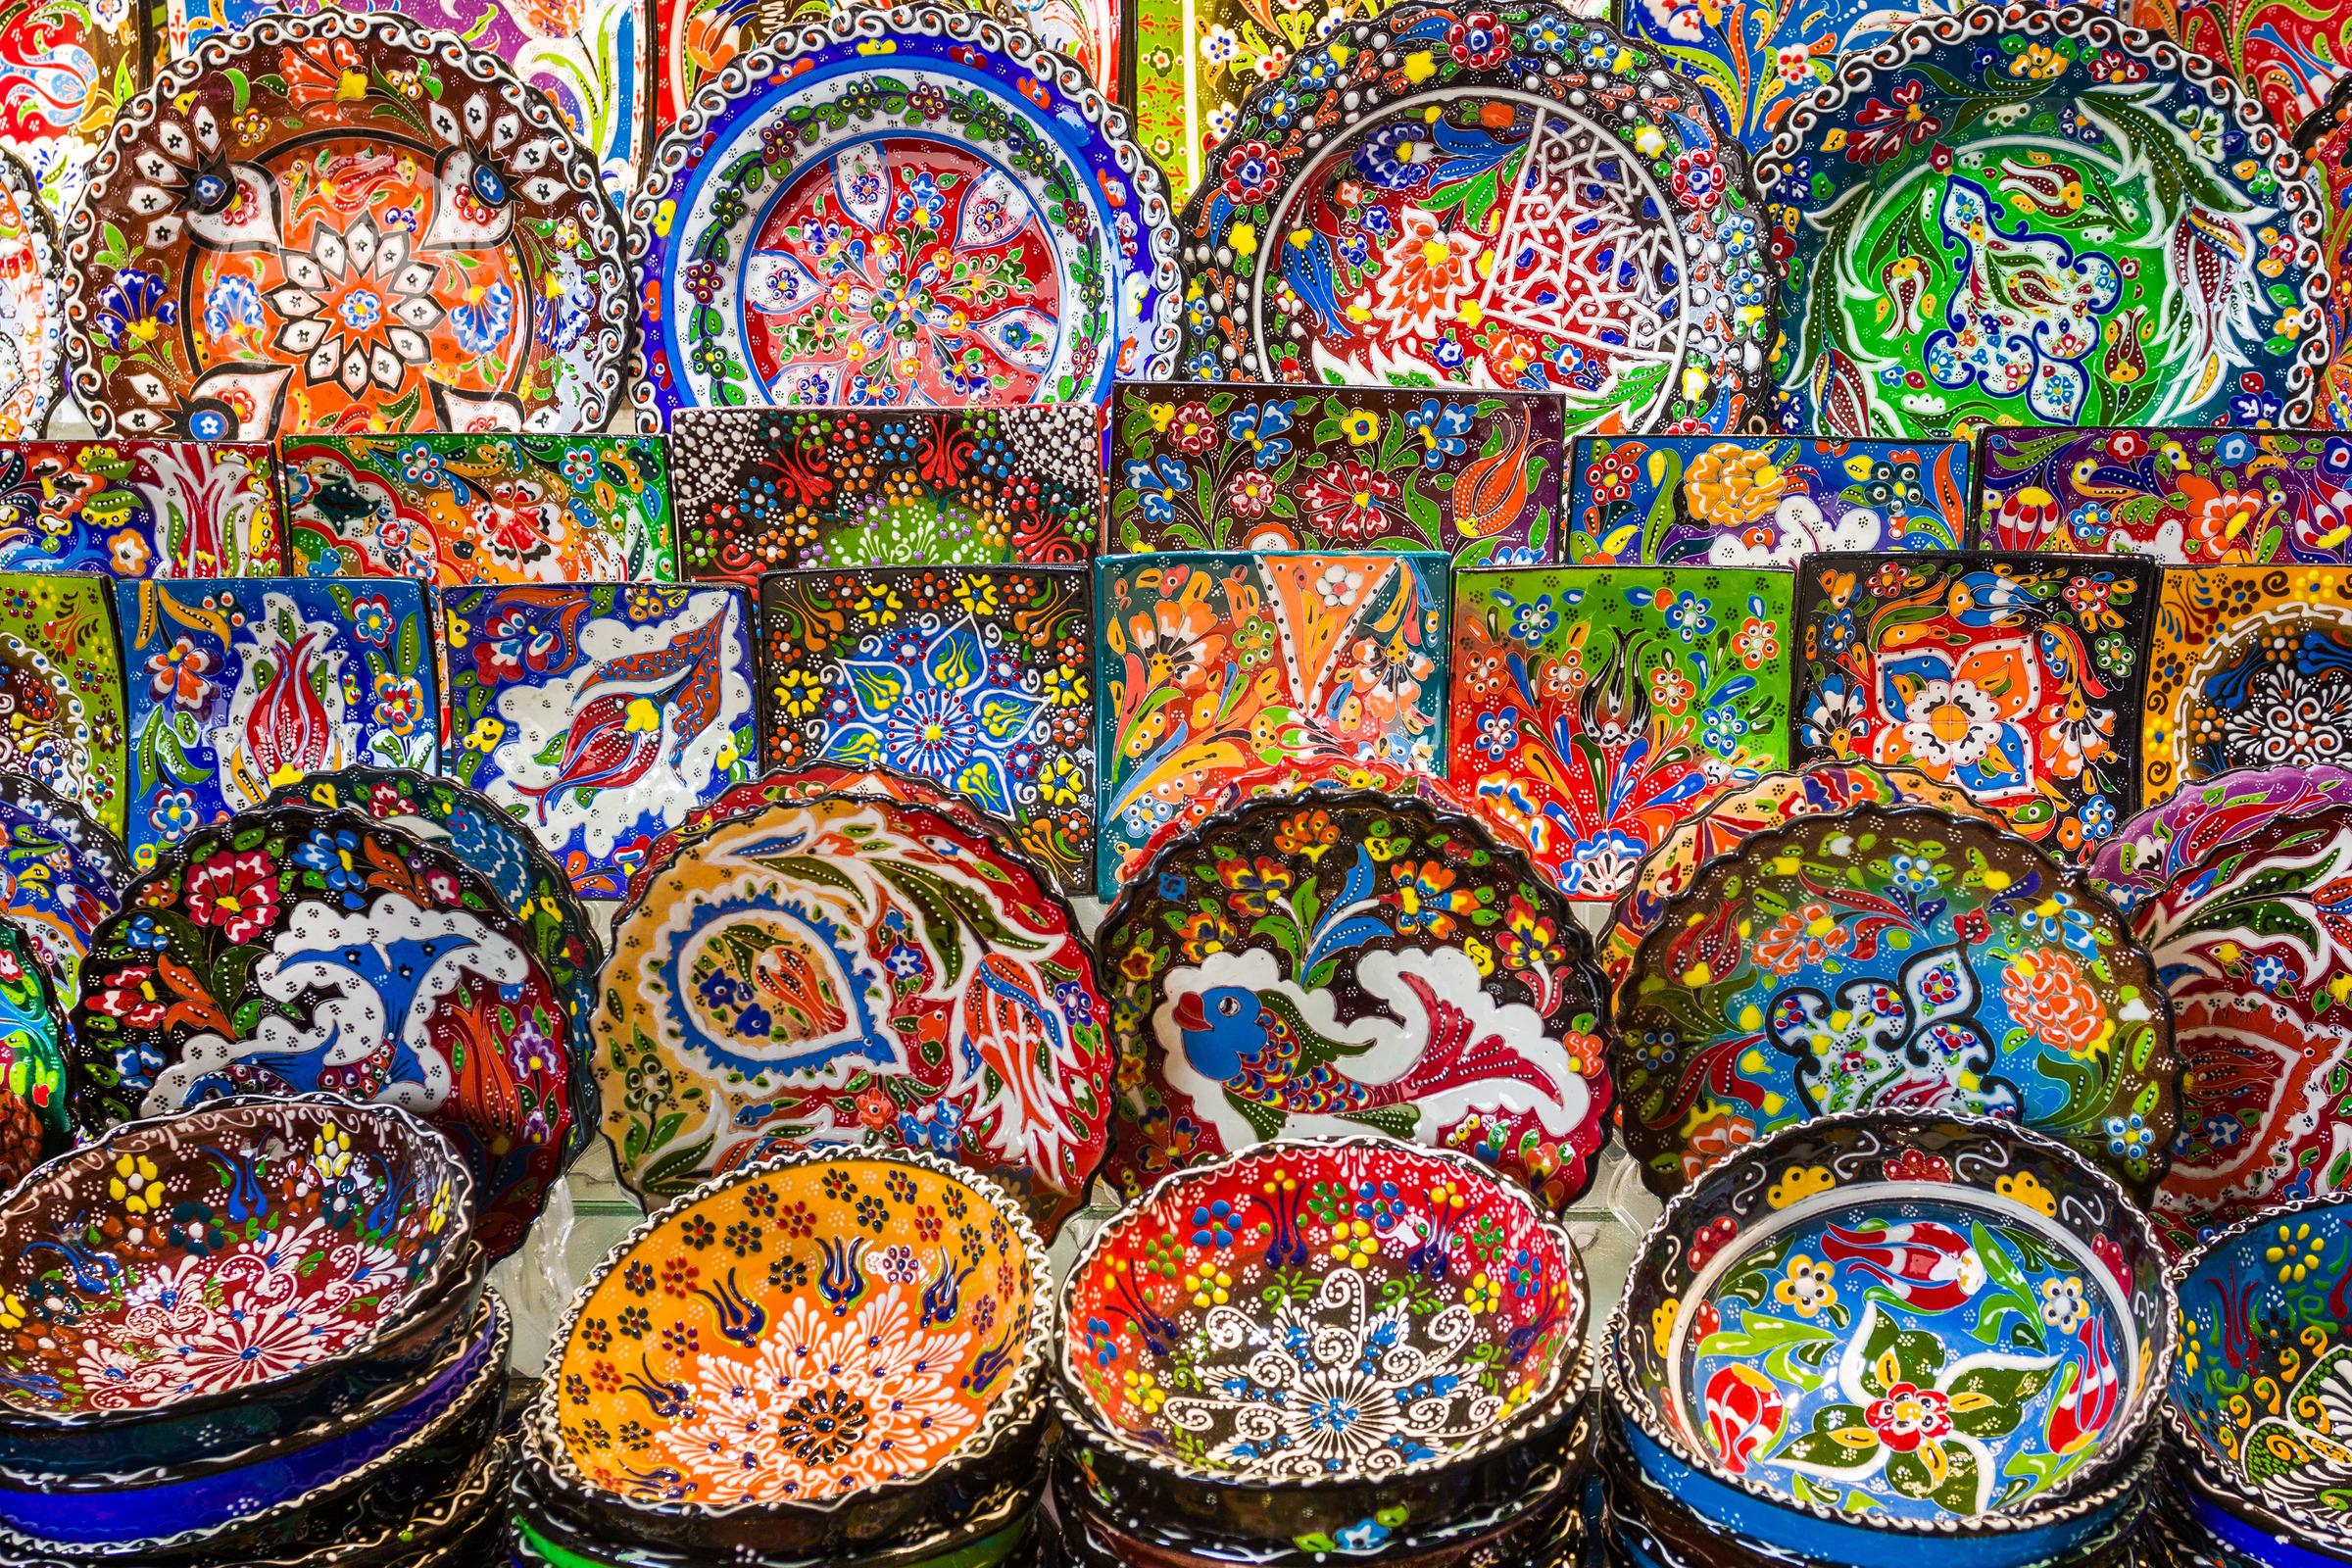 AFC Holidays - Uzbekistan Ceramic Art Souvenir